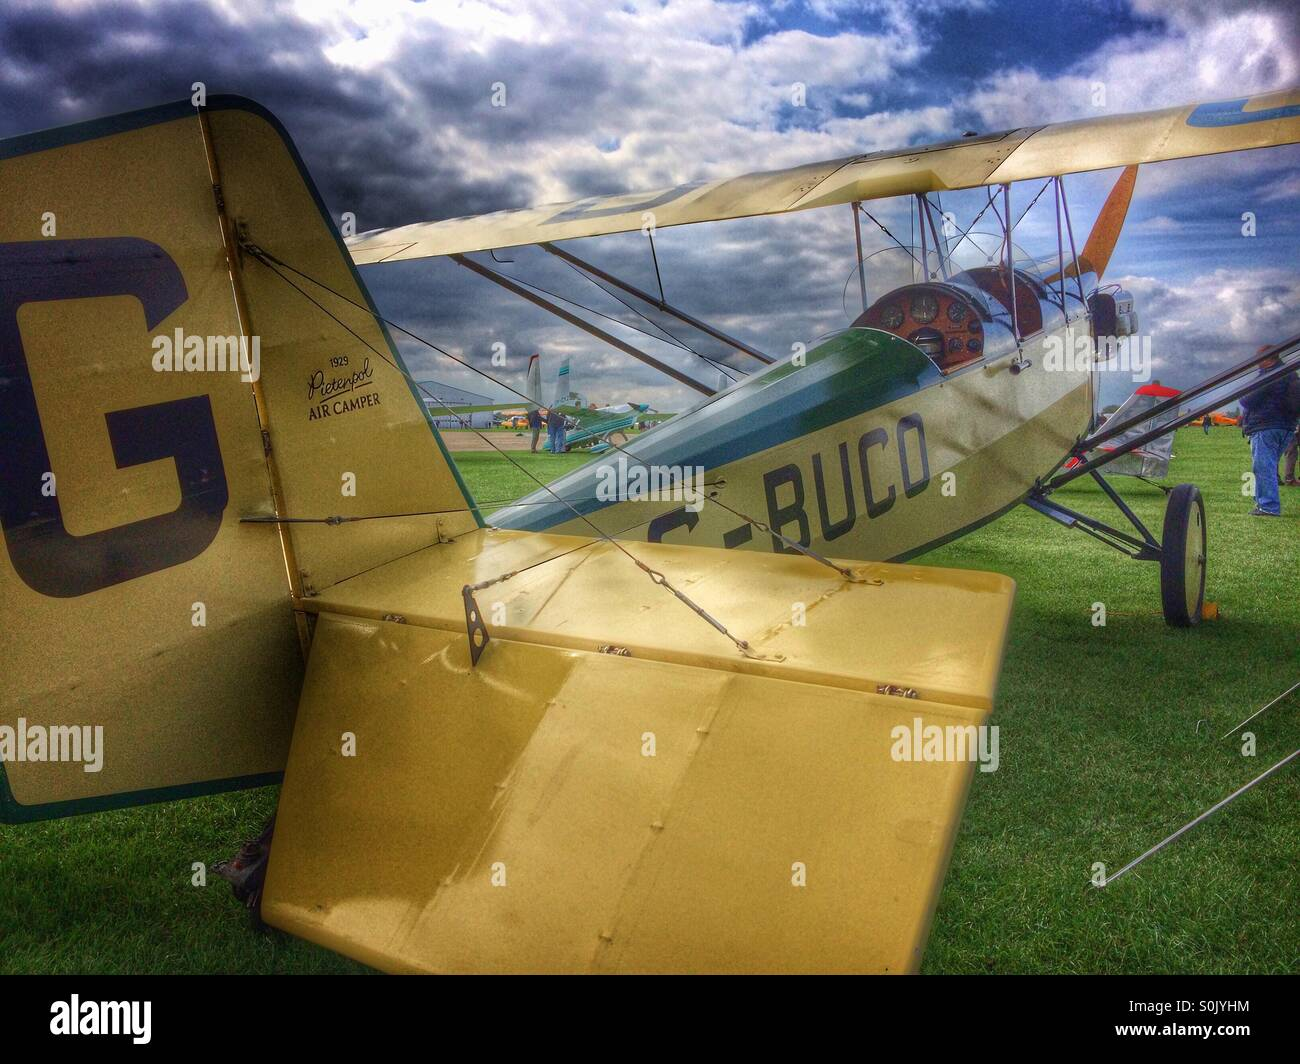 Pietenpol Air Camper 1929 vintage aircraft at LAA Rally Sywell Aerodrome - Stock Image